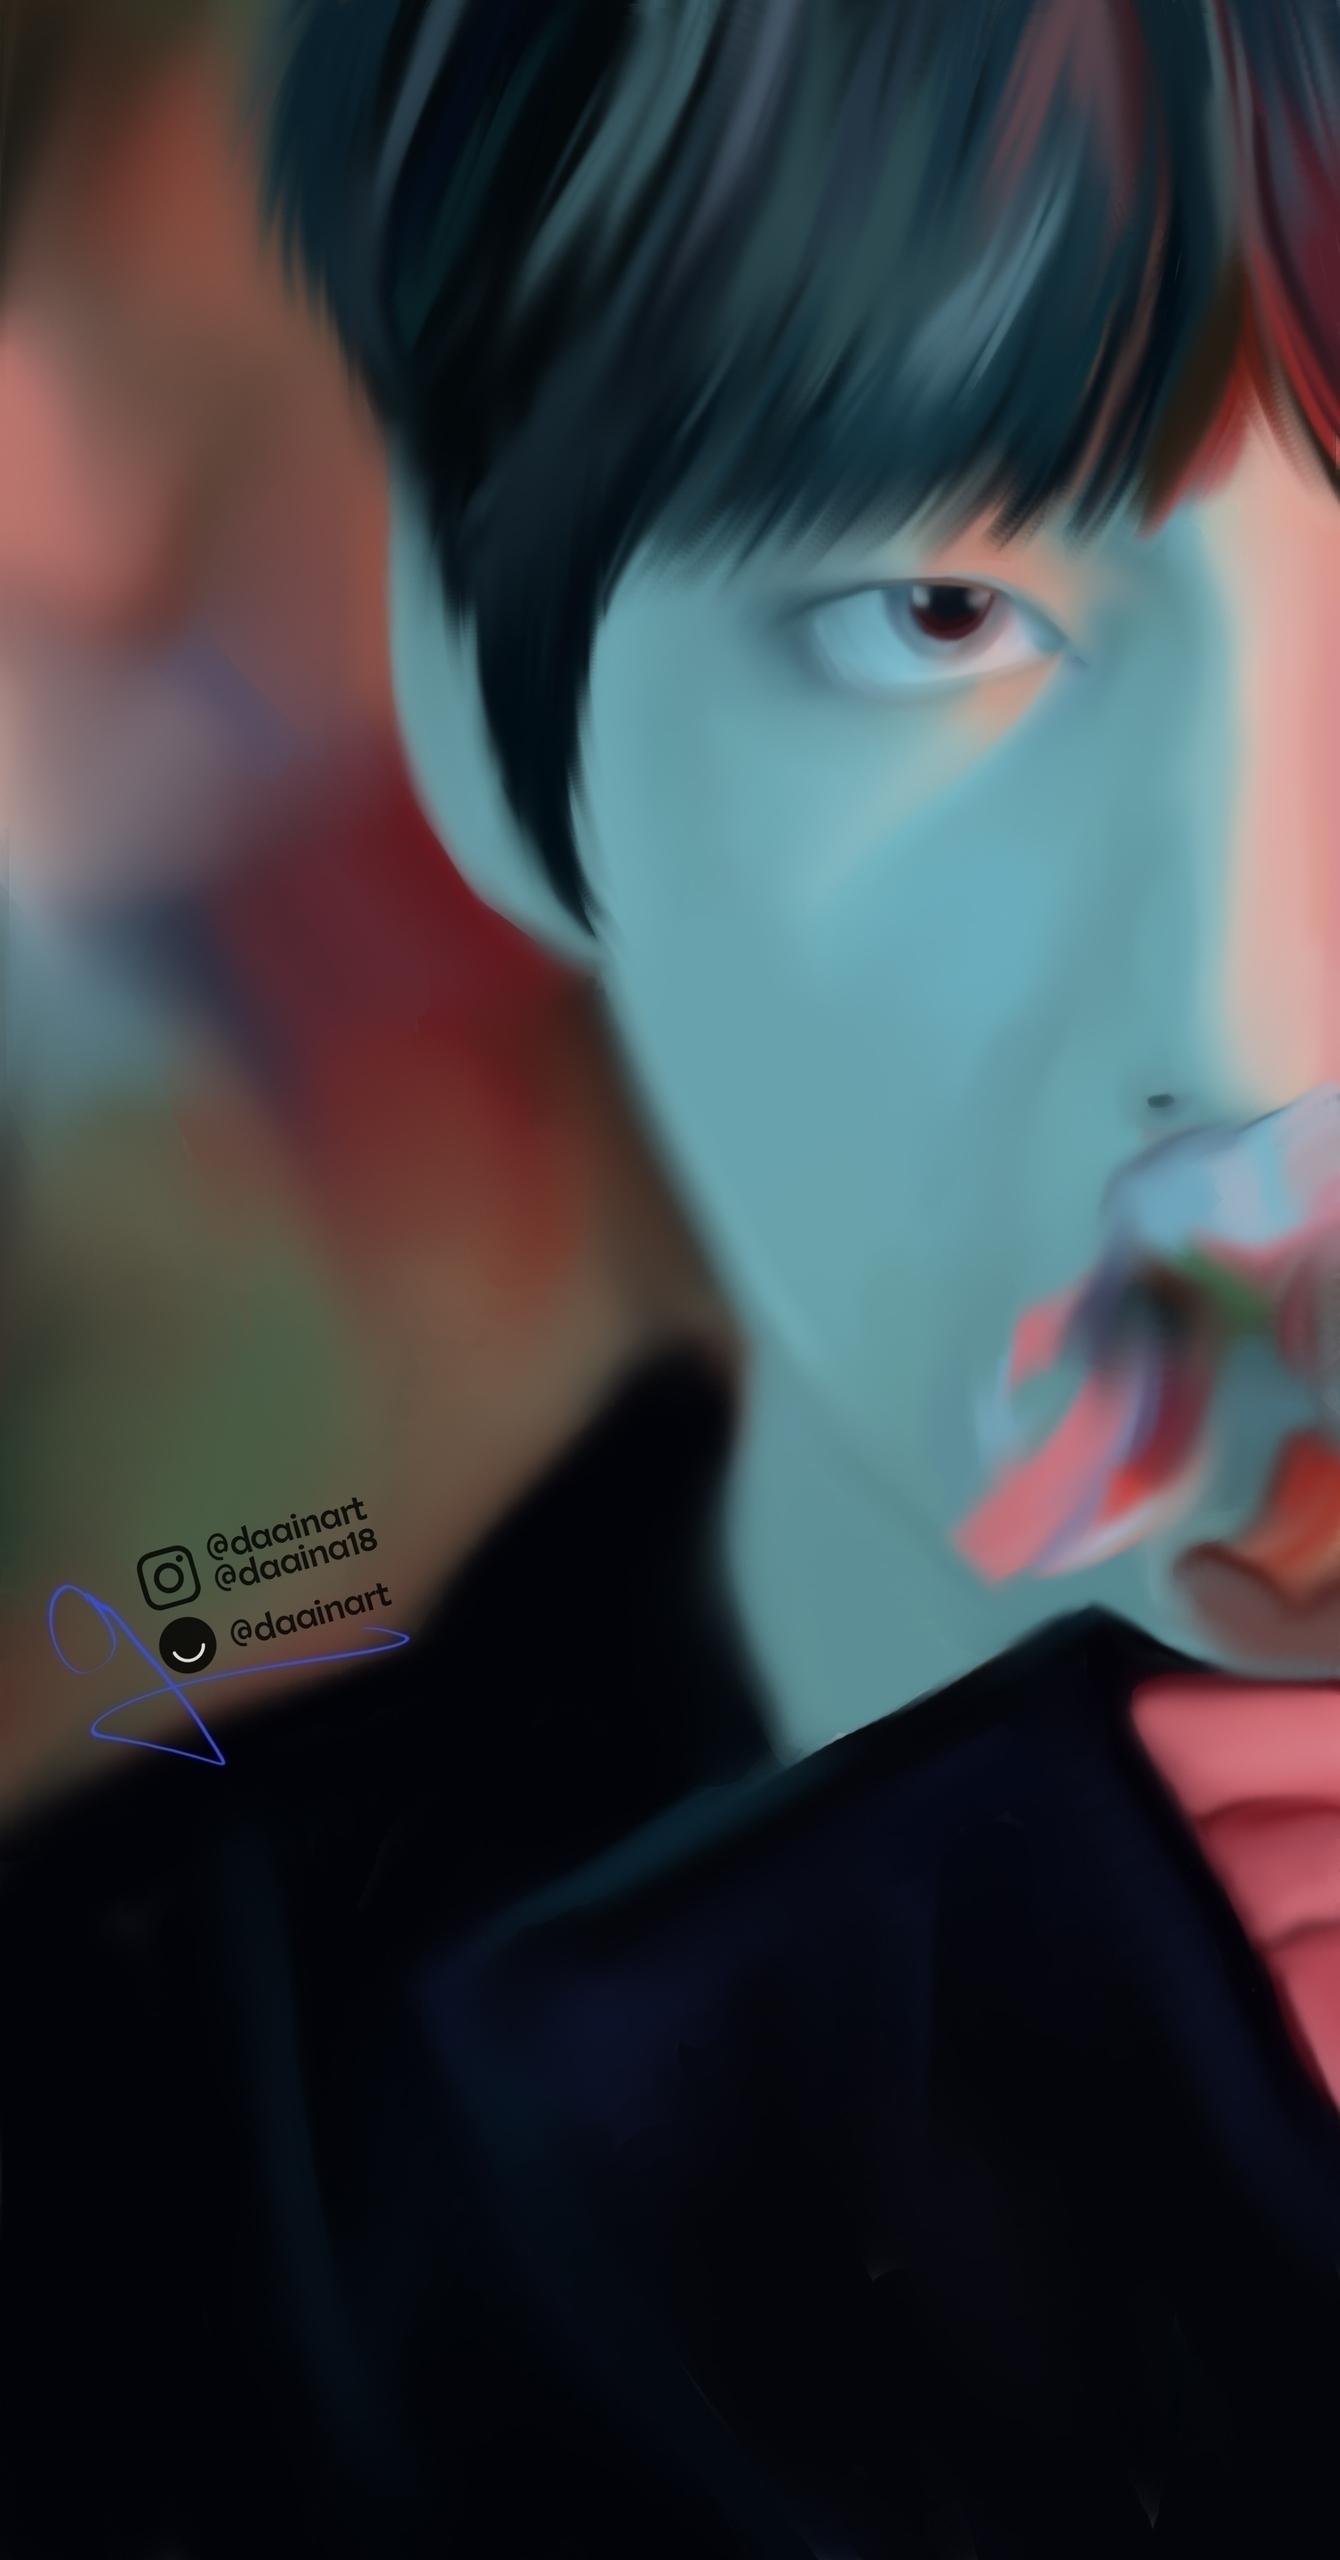 BTS Bangtangboys Intro Singular - daainart | ello